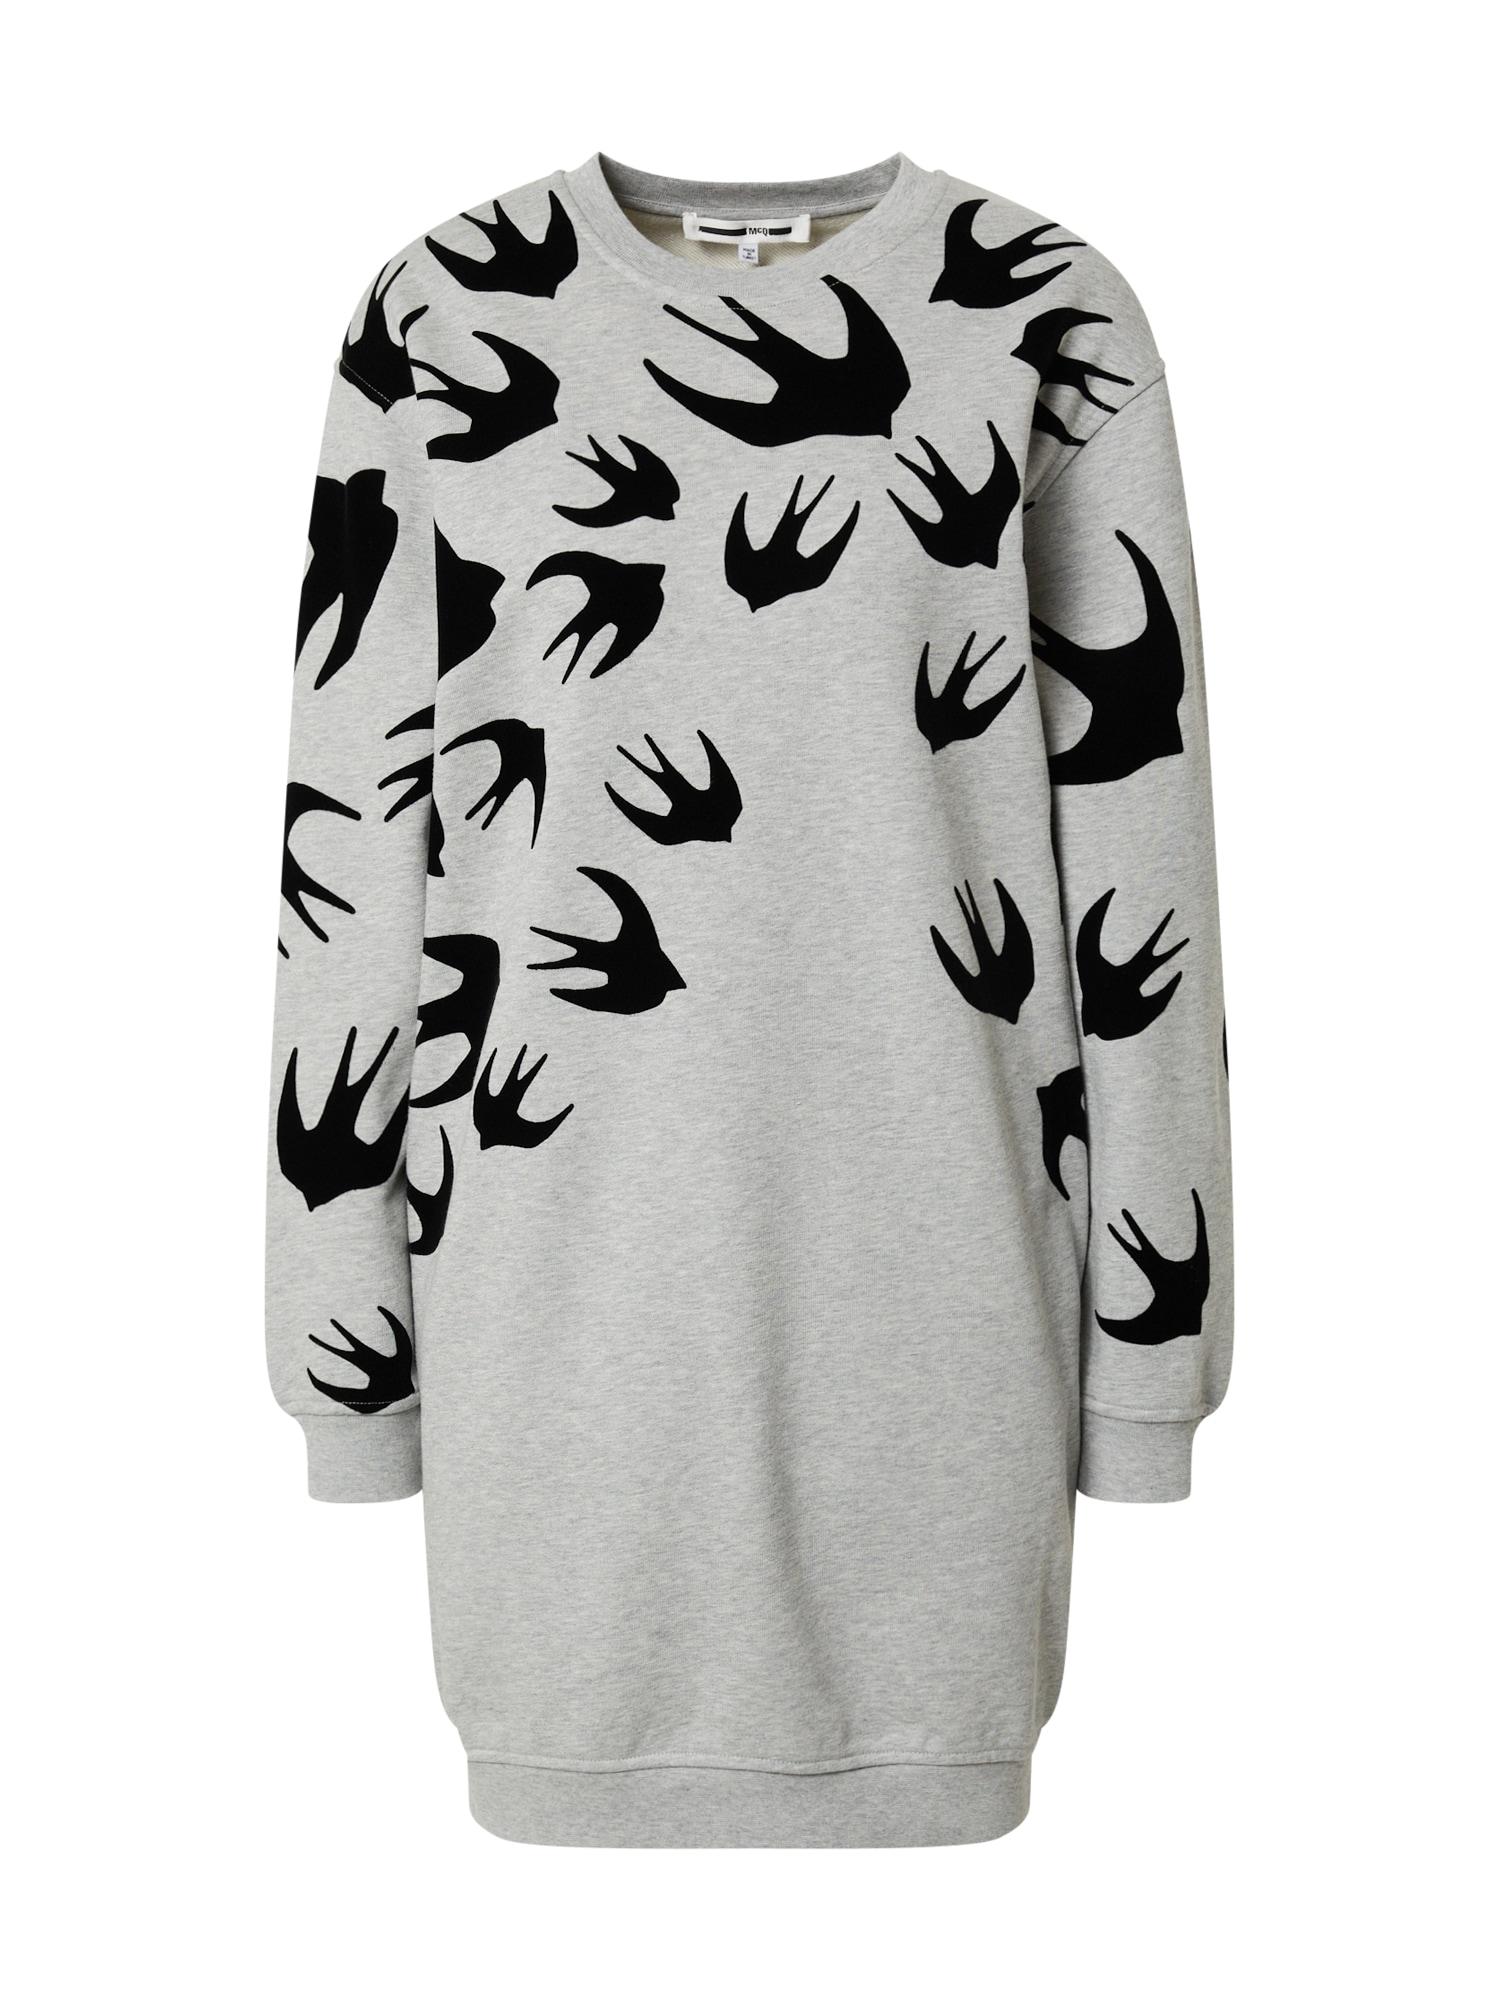 McQ Alexander McQueen Suknelė juoda / pilka